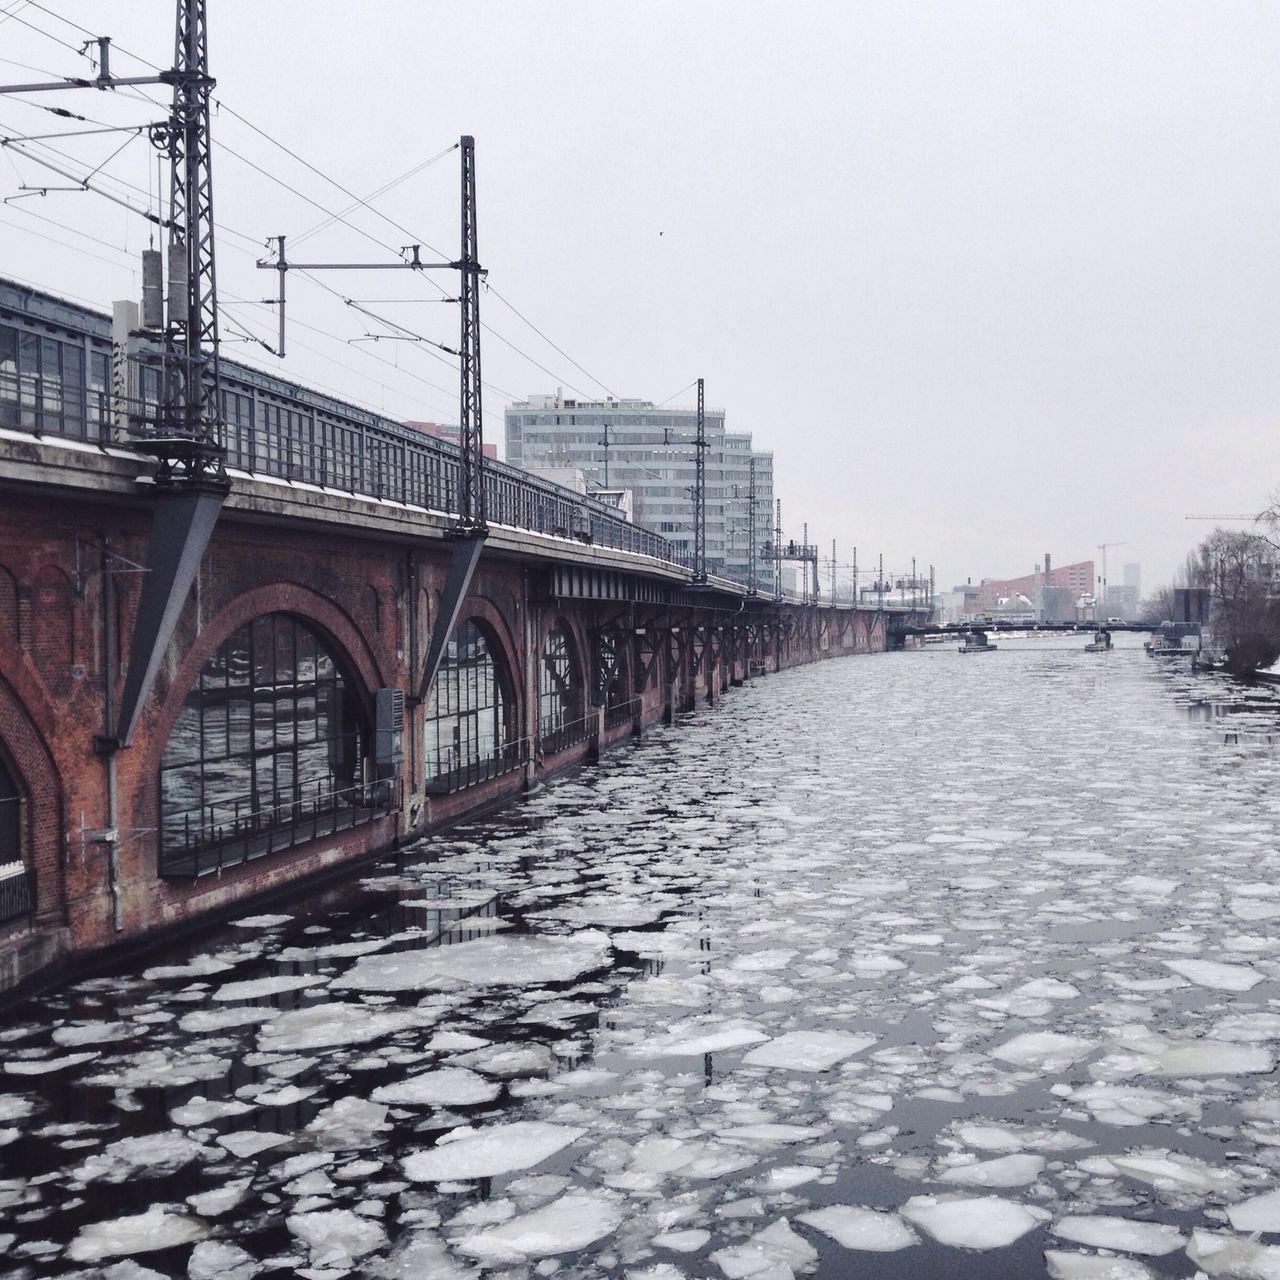 Frozen river by bridge against clear sky